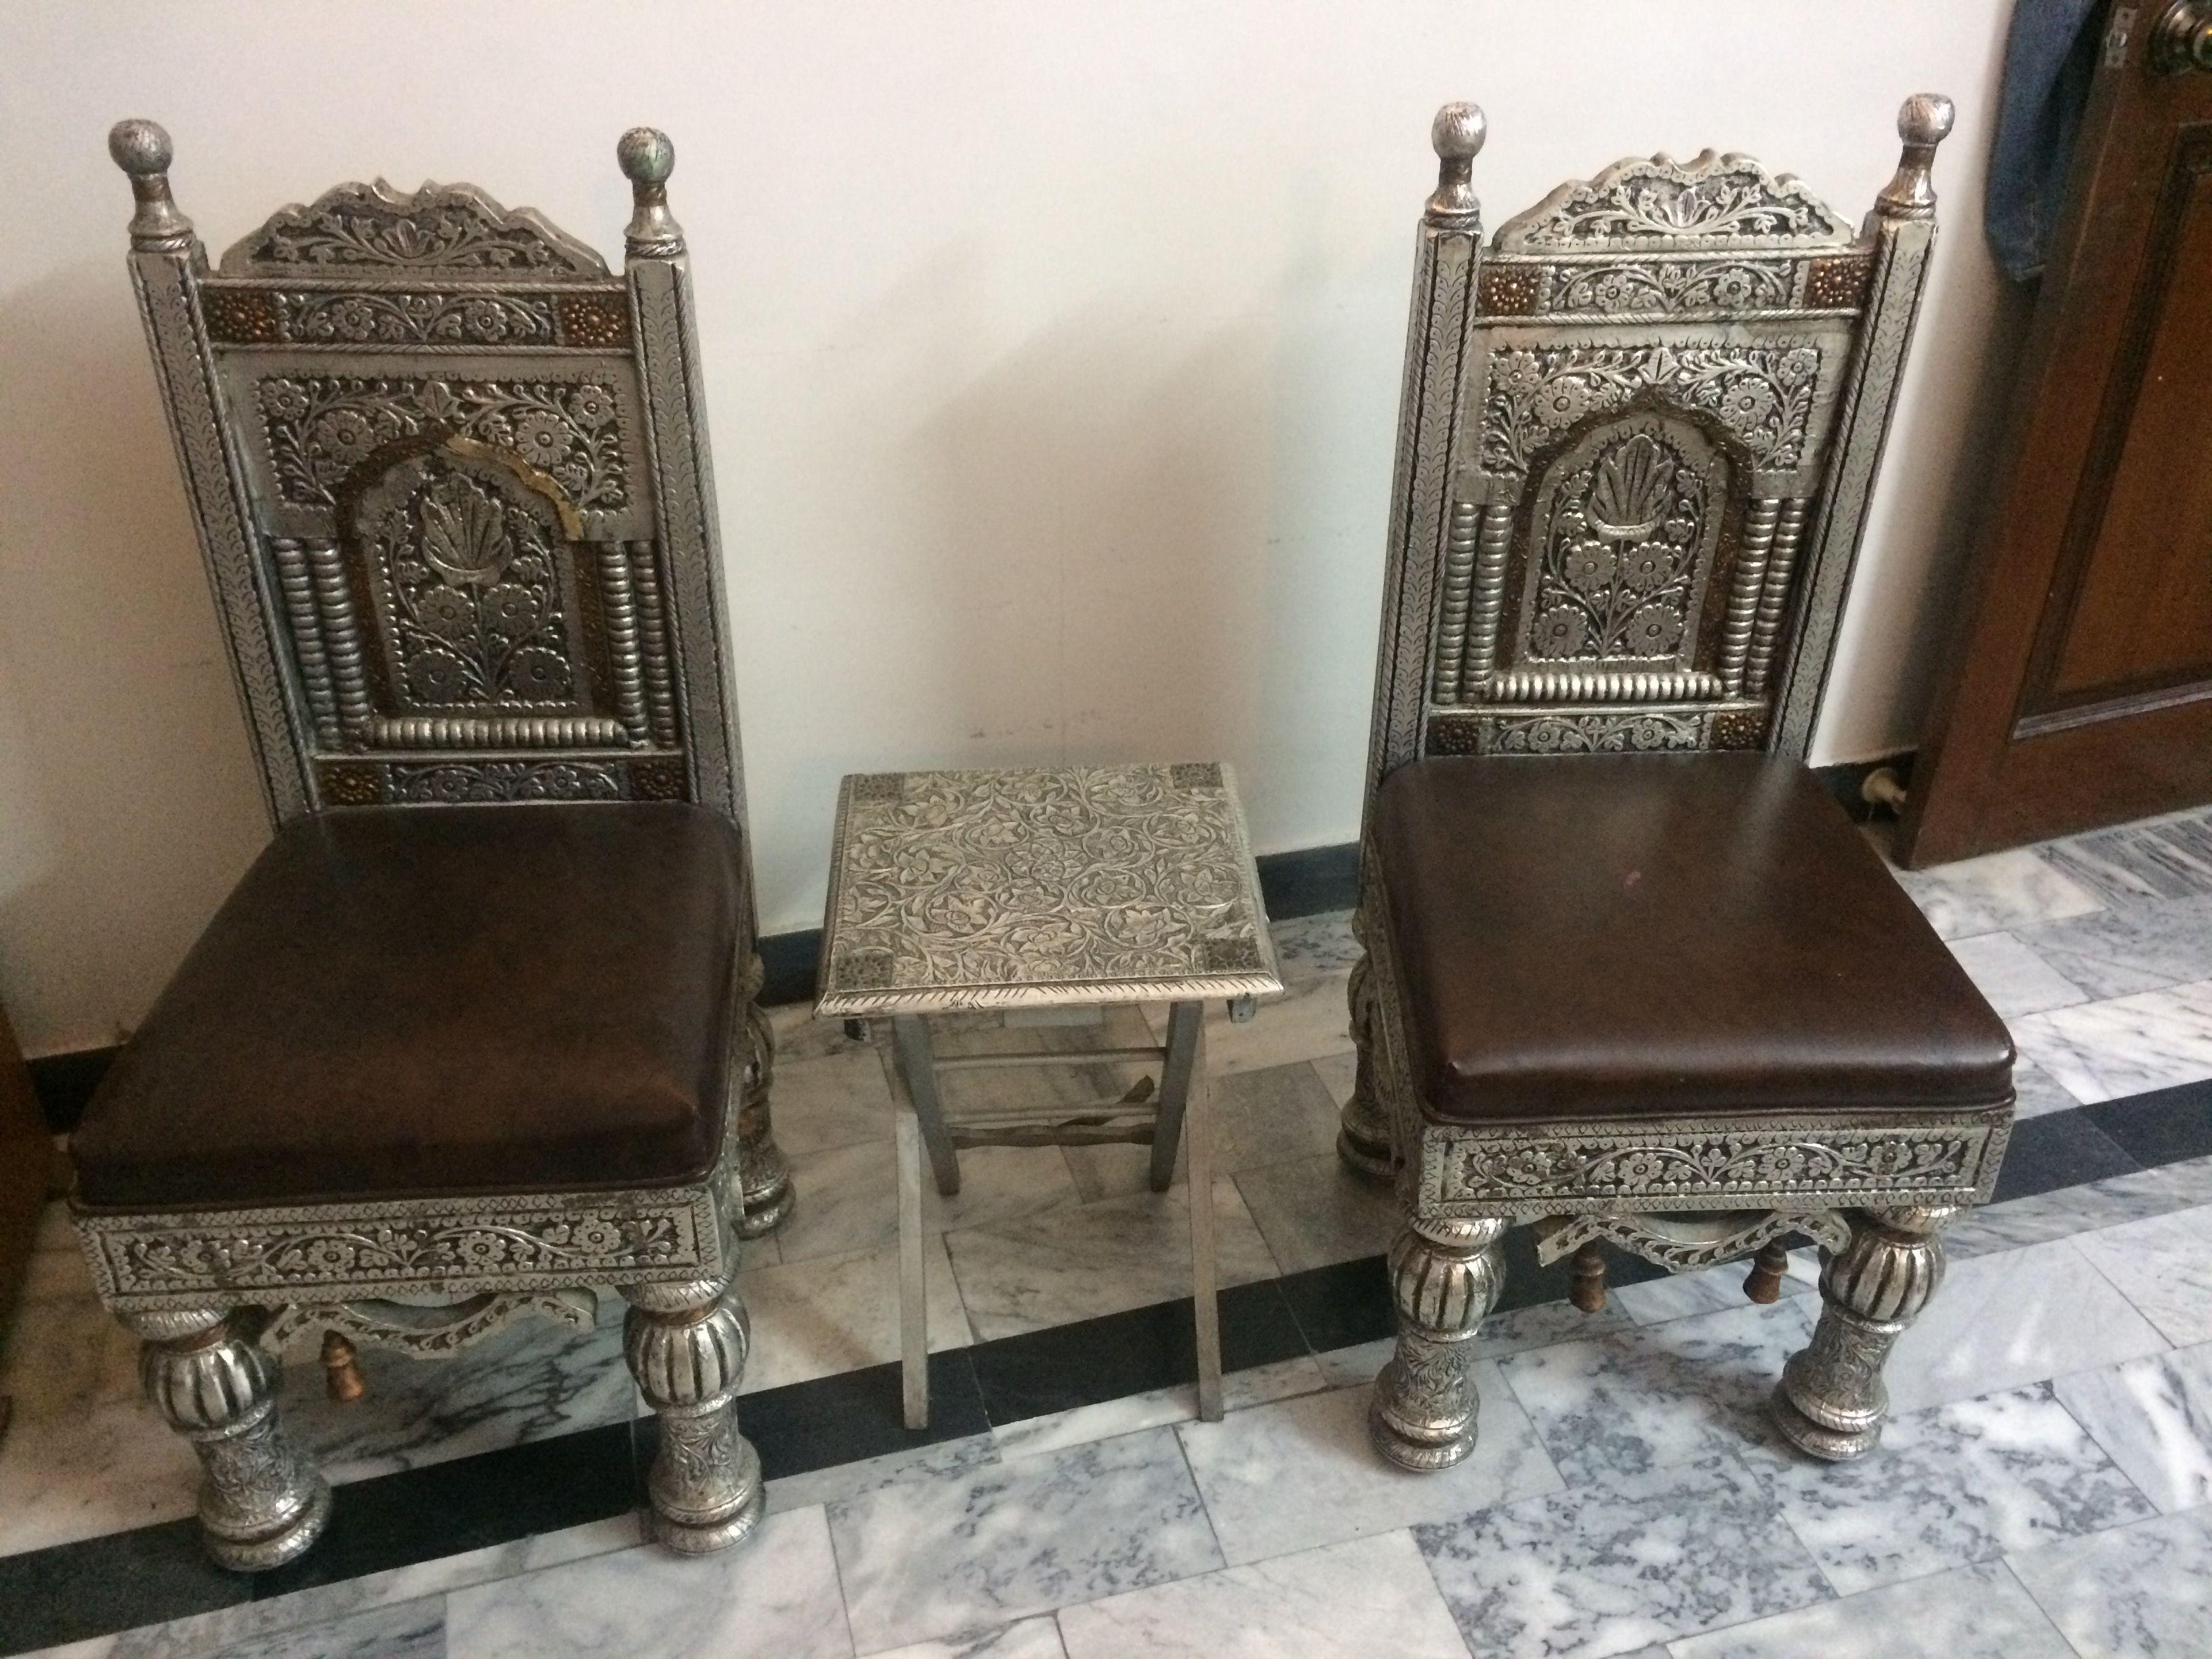 Antique Chairs Karachi Pkr 30000 Antique Chairs Chair Home Decor